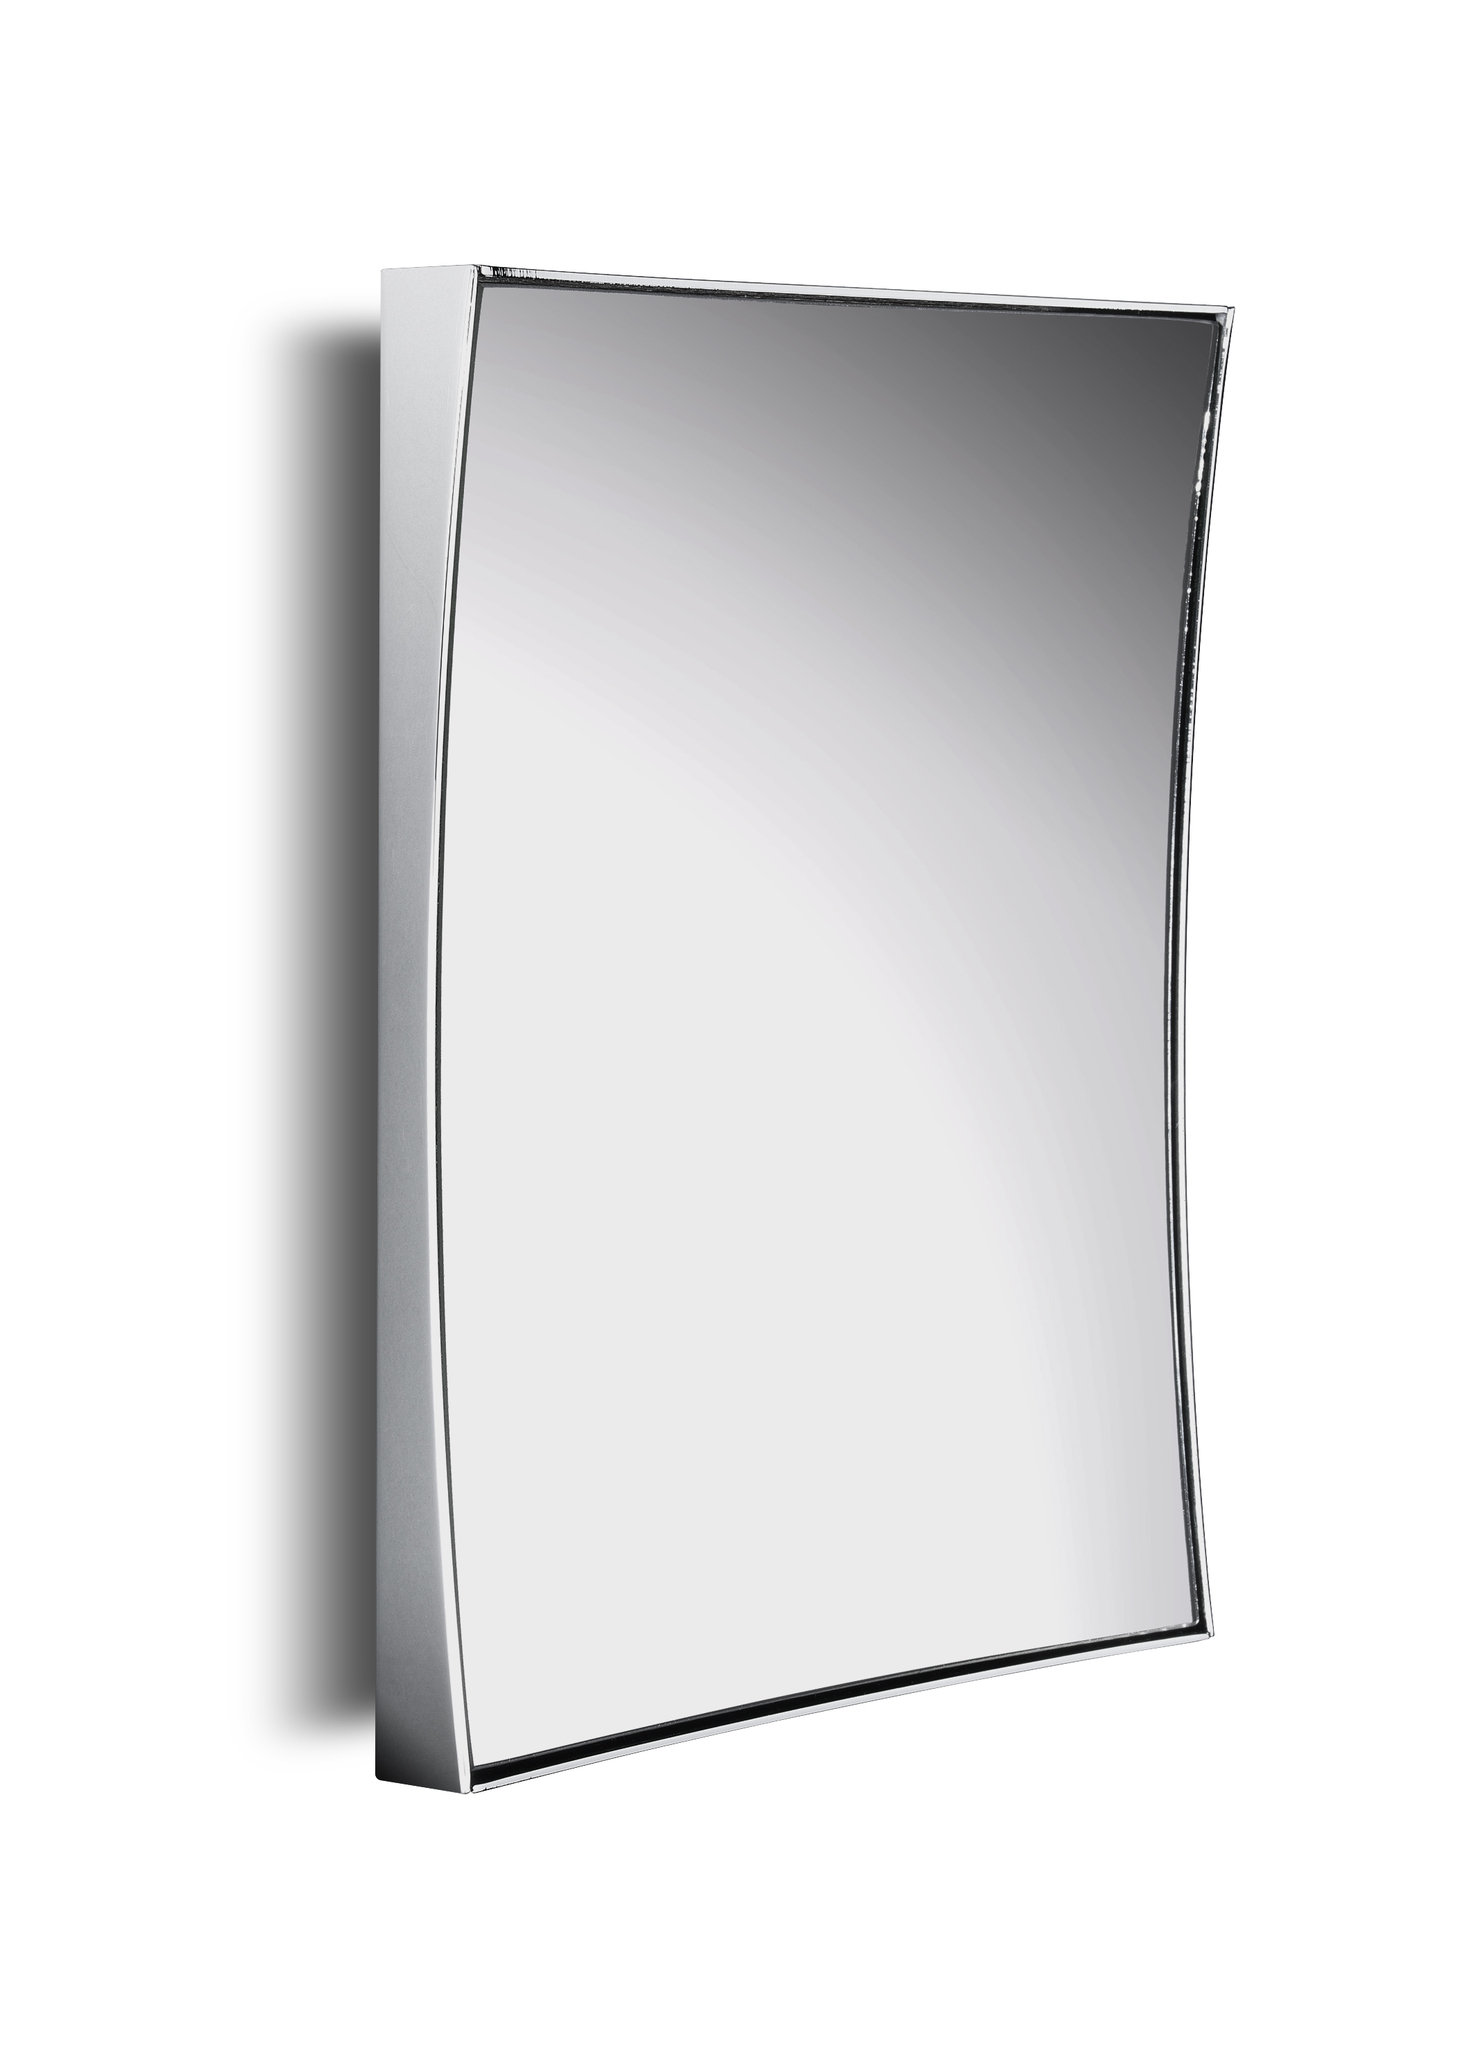 Зеркала Зеркало косметическое на присосках Windisch 99306CR 5X elitnoe-zerkalo-kosmeticheskoe-na-prisoskah-99306-ot-windisch-ispaniya.jpg